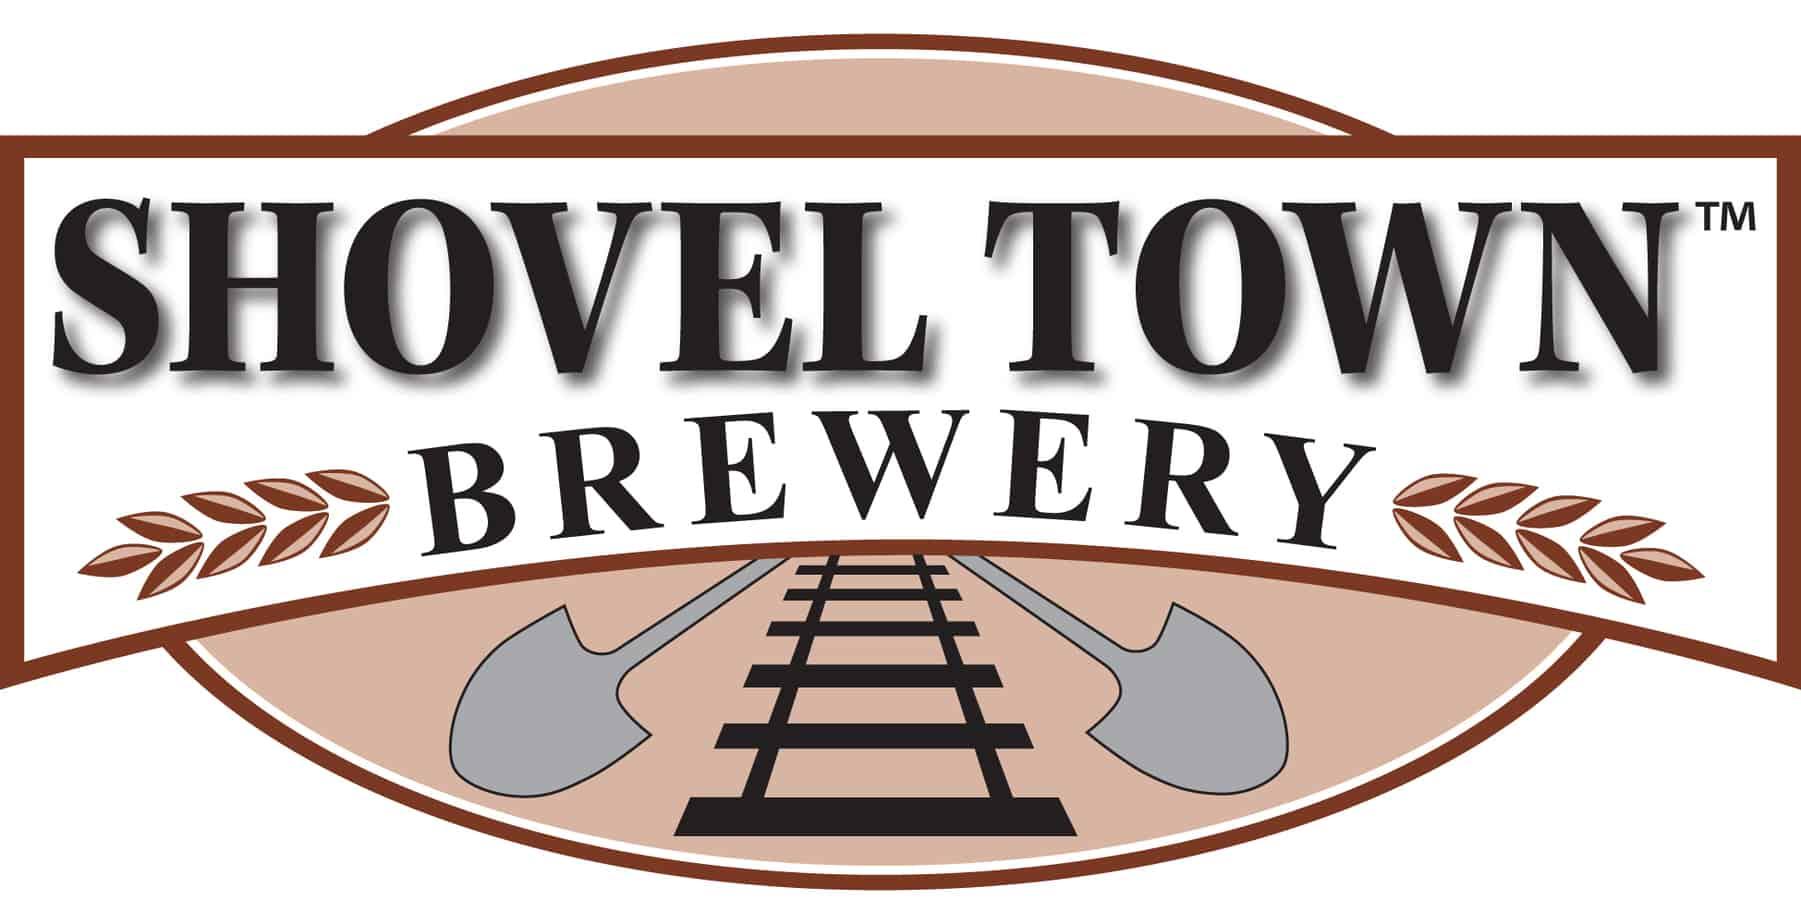 Shovel Town Brewery, Easton, MA